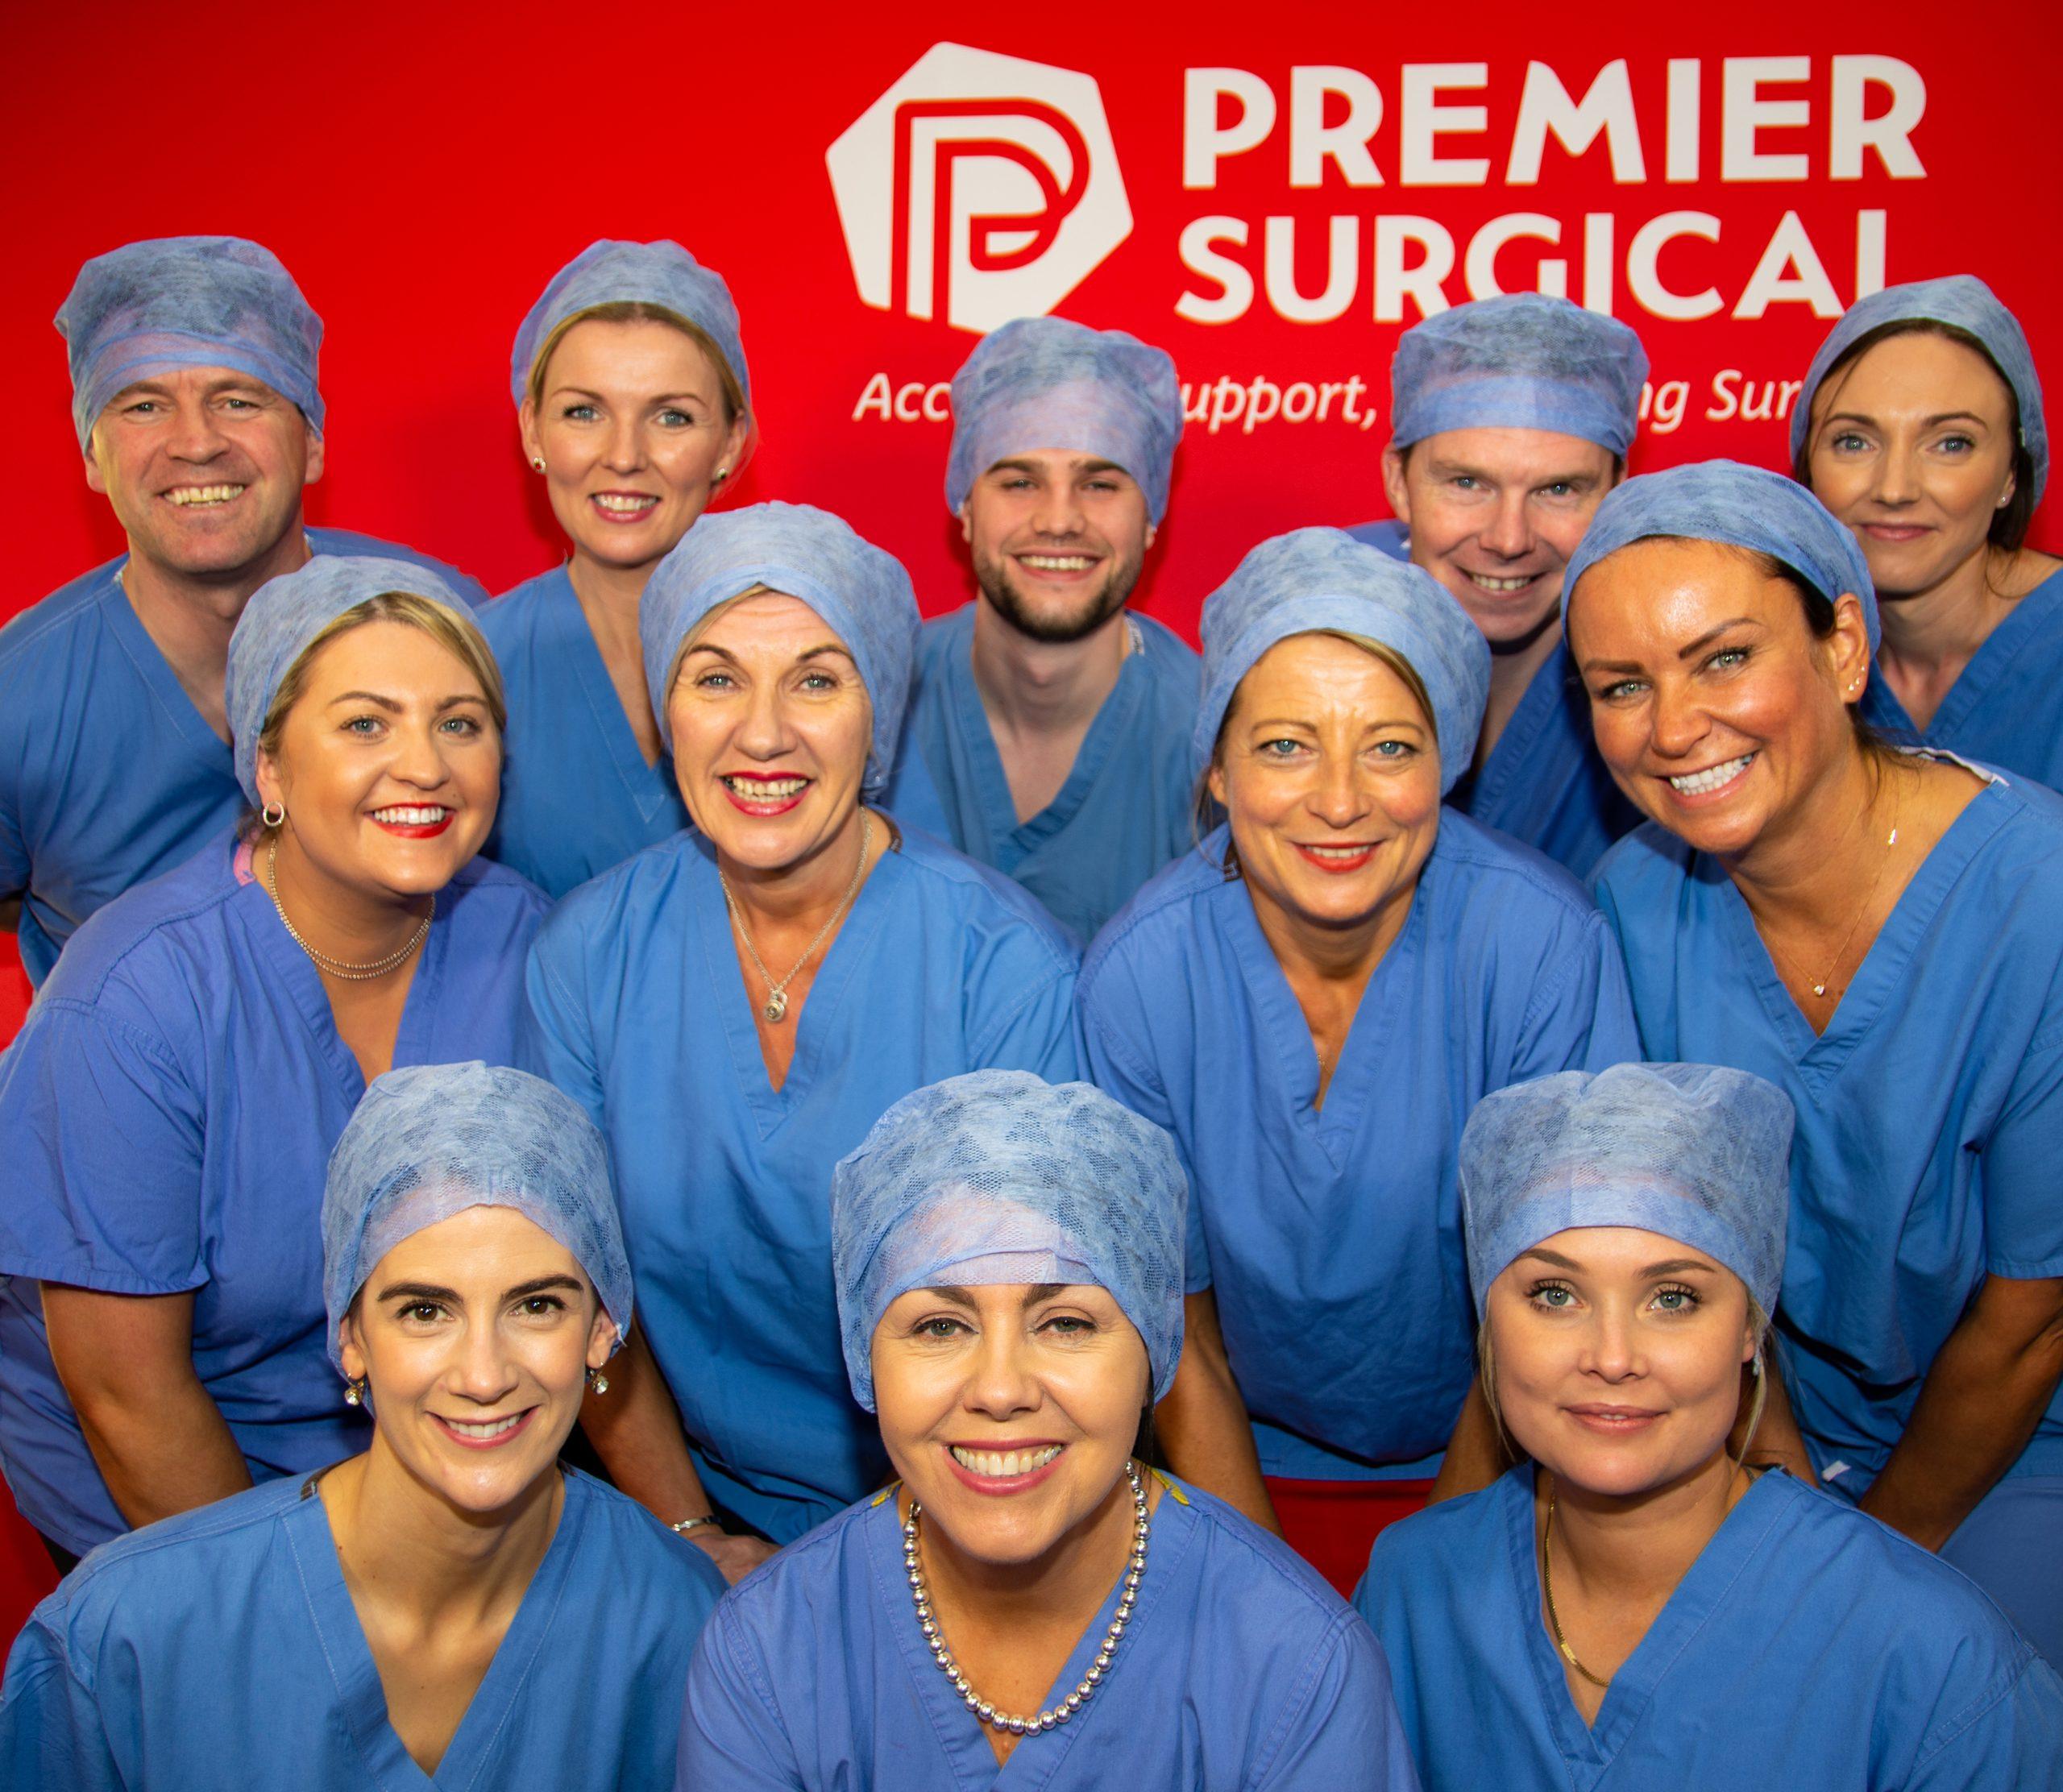 Premier Surgical Brand Launch